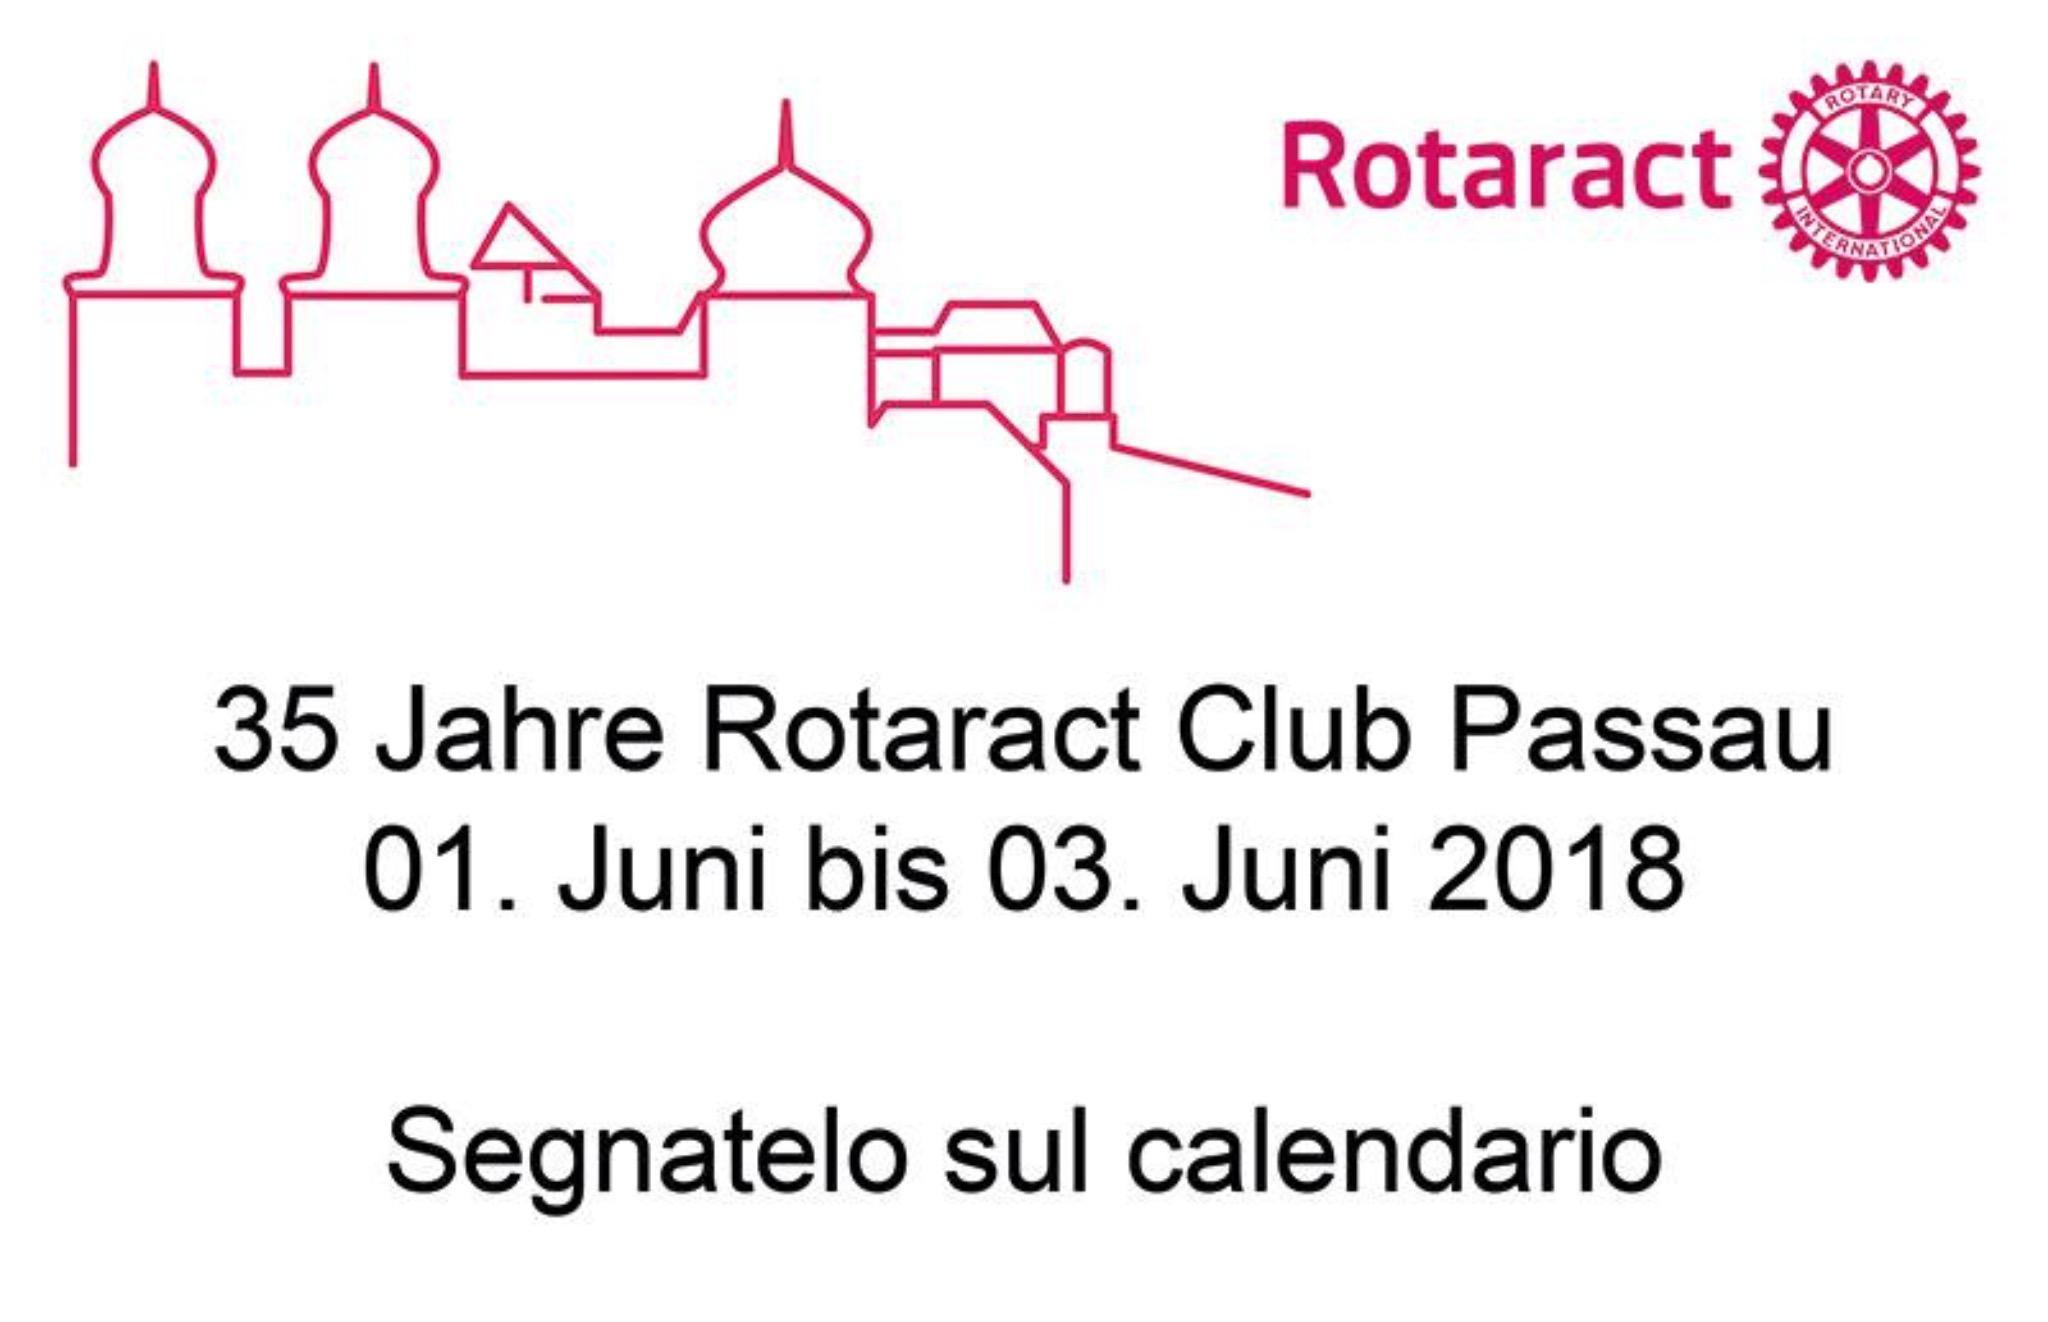 Charter - 35 Jahre Rotaract Club Passau